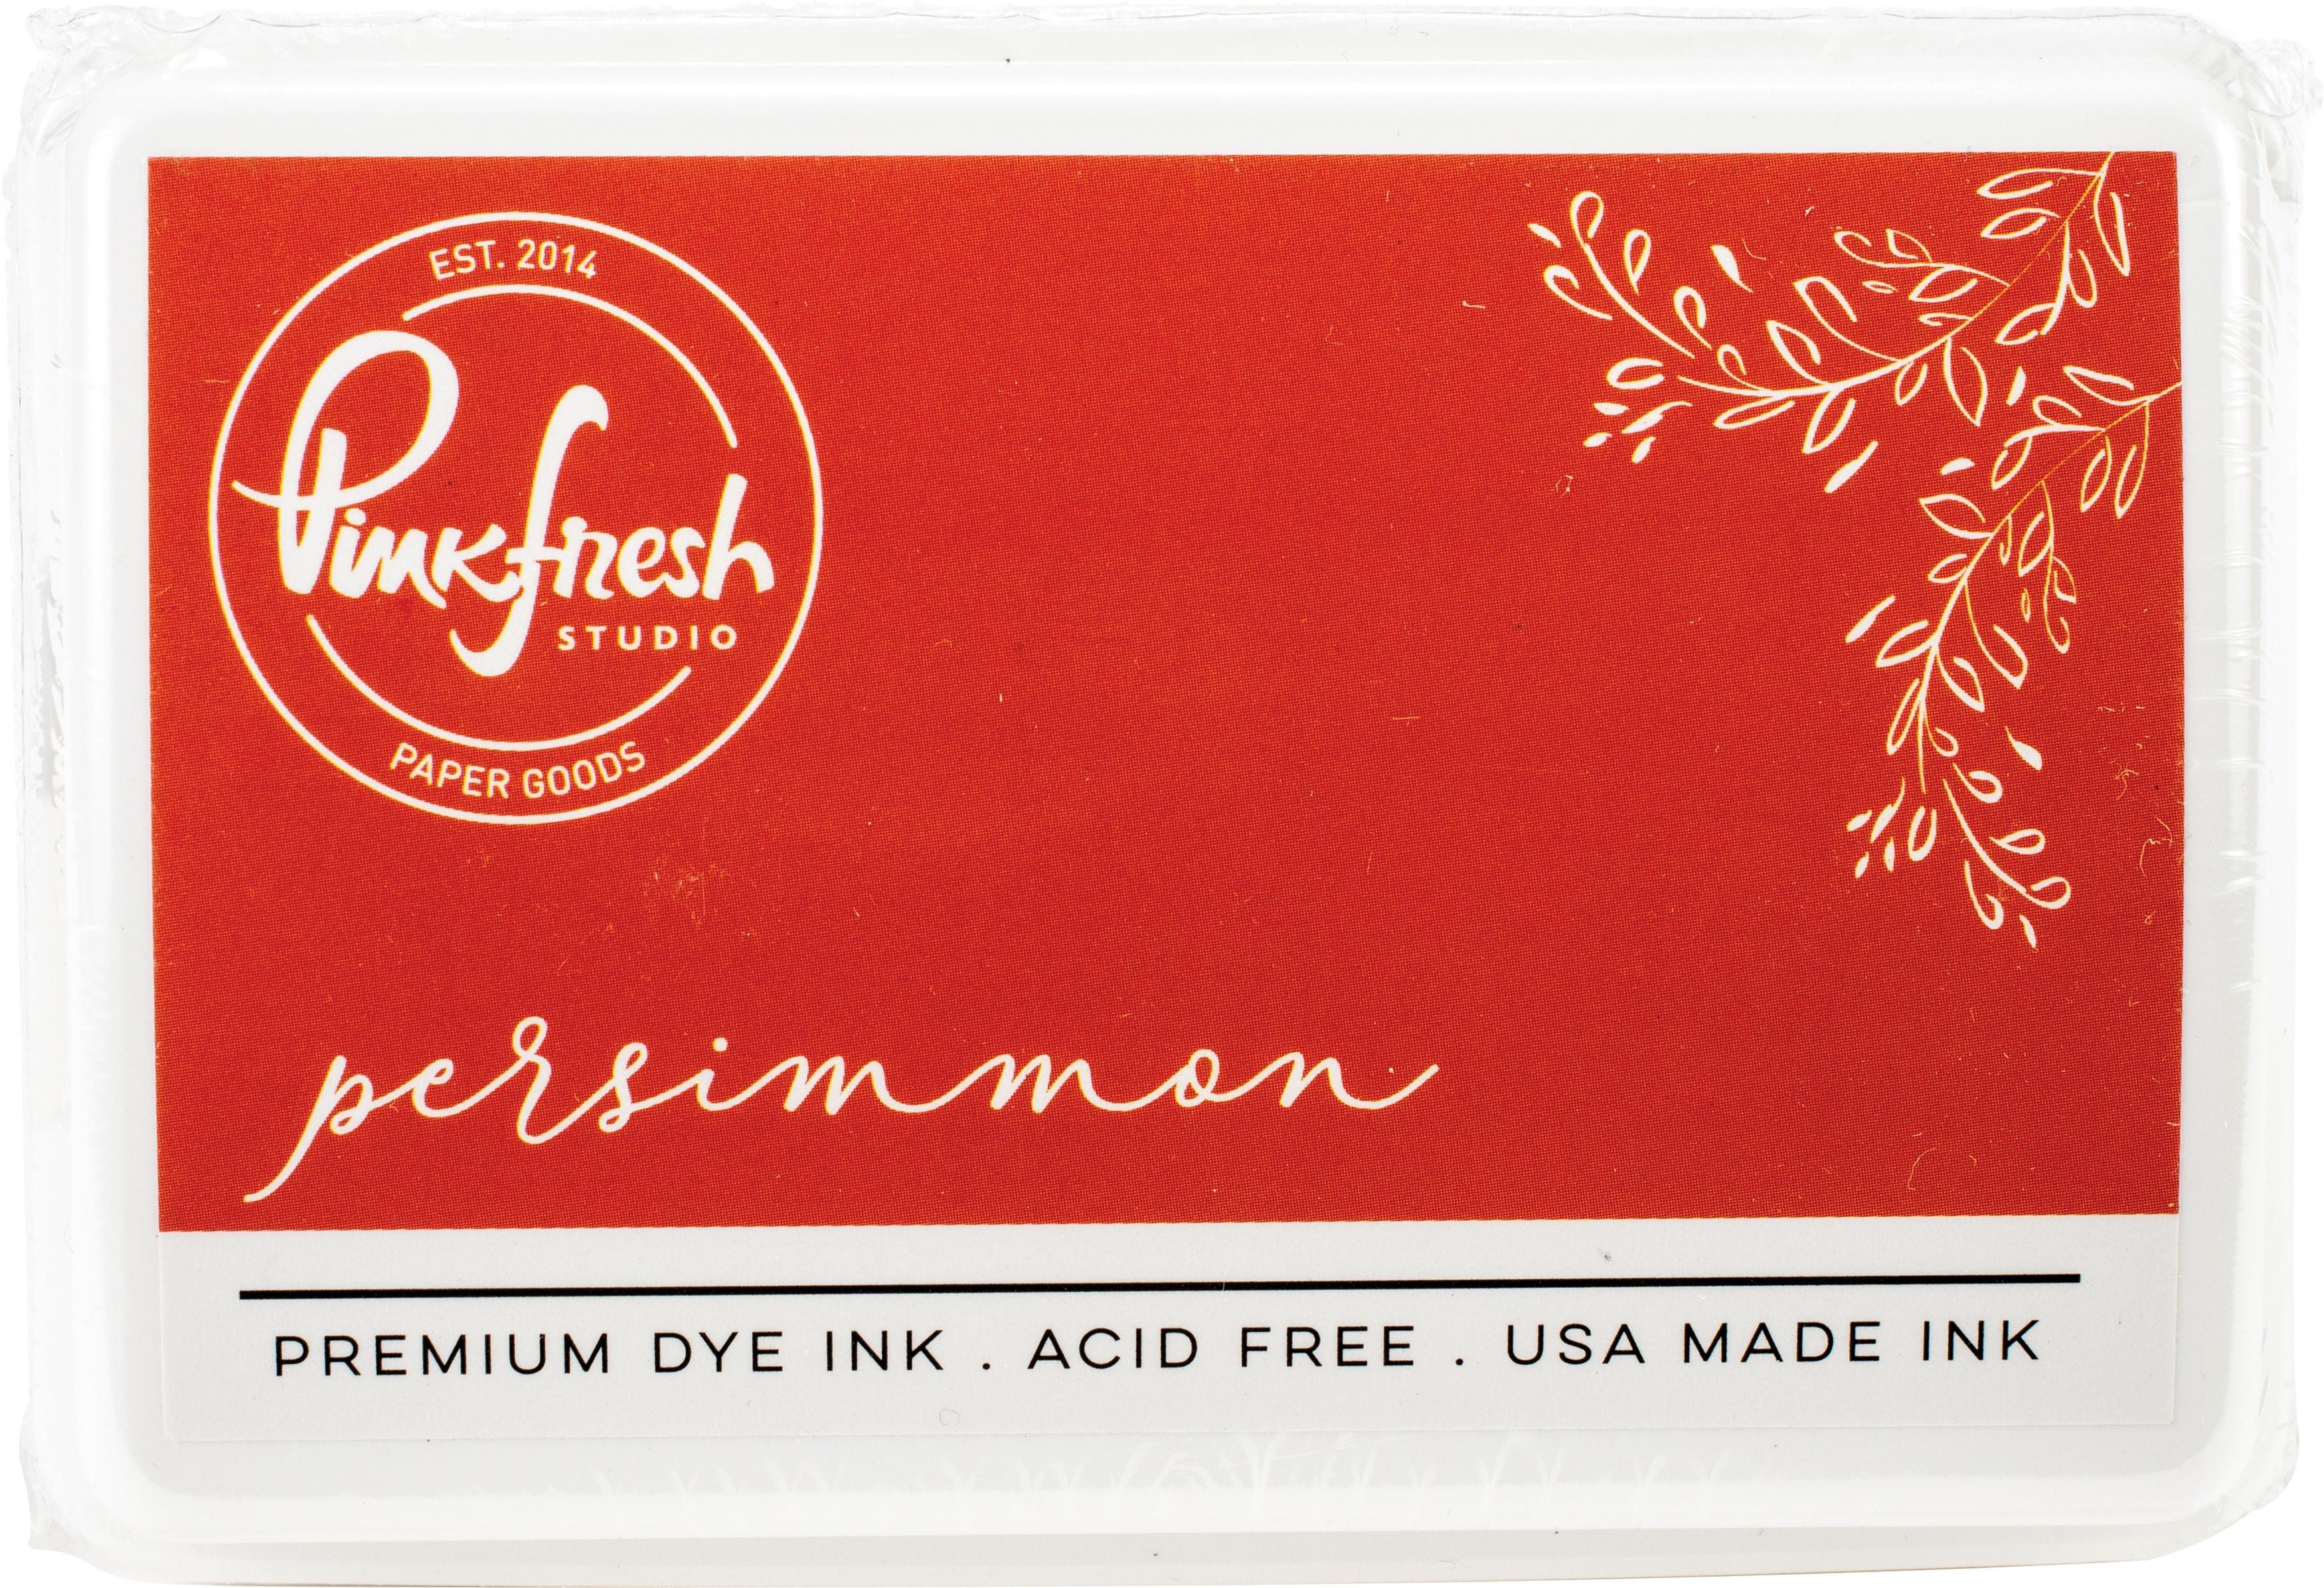 PinkFresh - Premium Dye Ink Pad - Persimmon